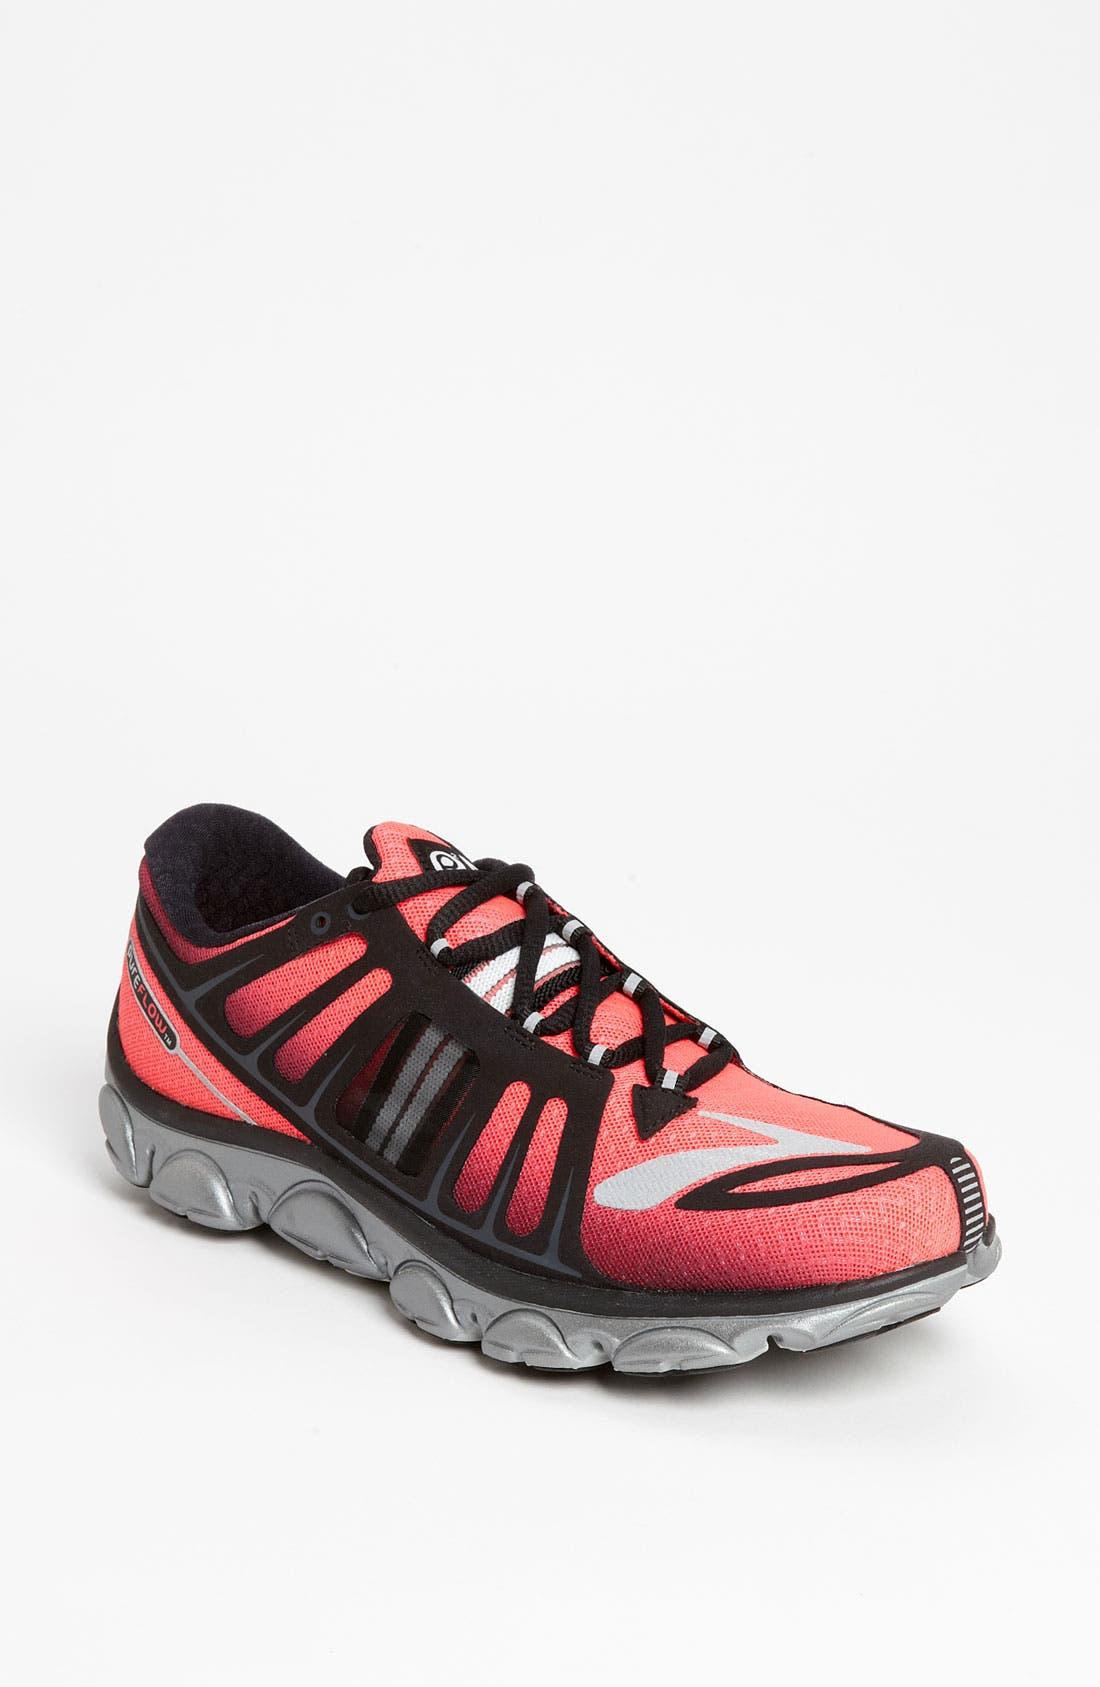 Main Image - Brooks 'PureFlow 2' Running Shoe (Women)(Regular Retail Price: $99.95)